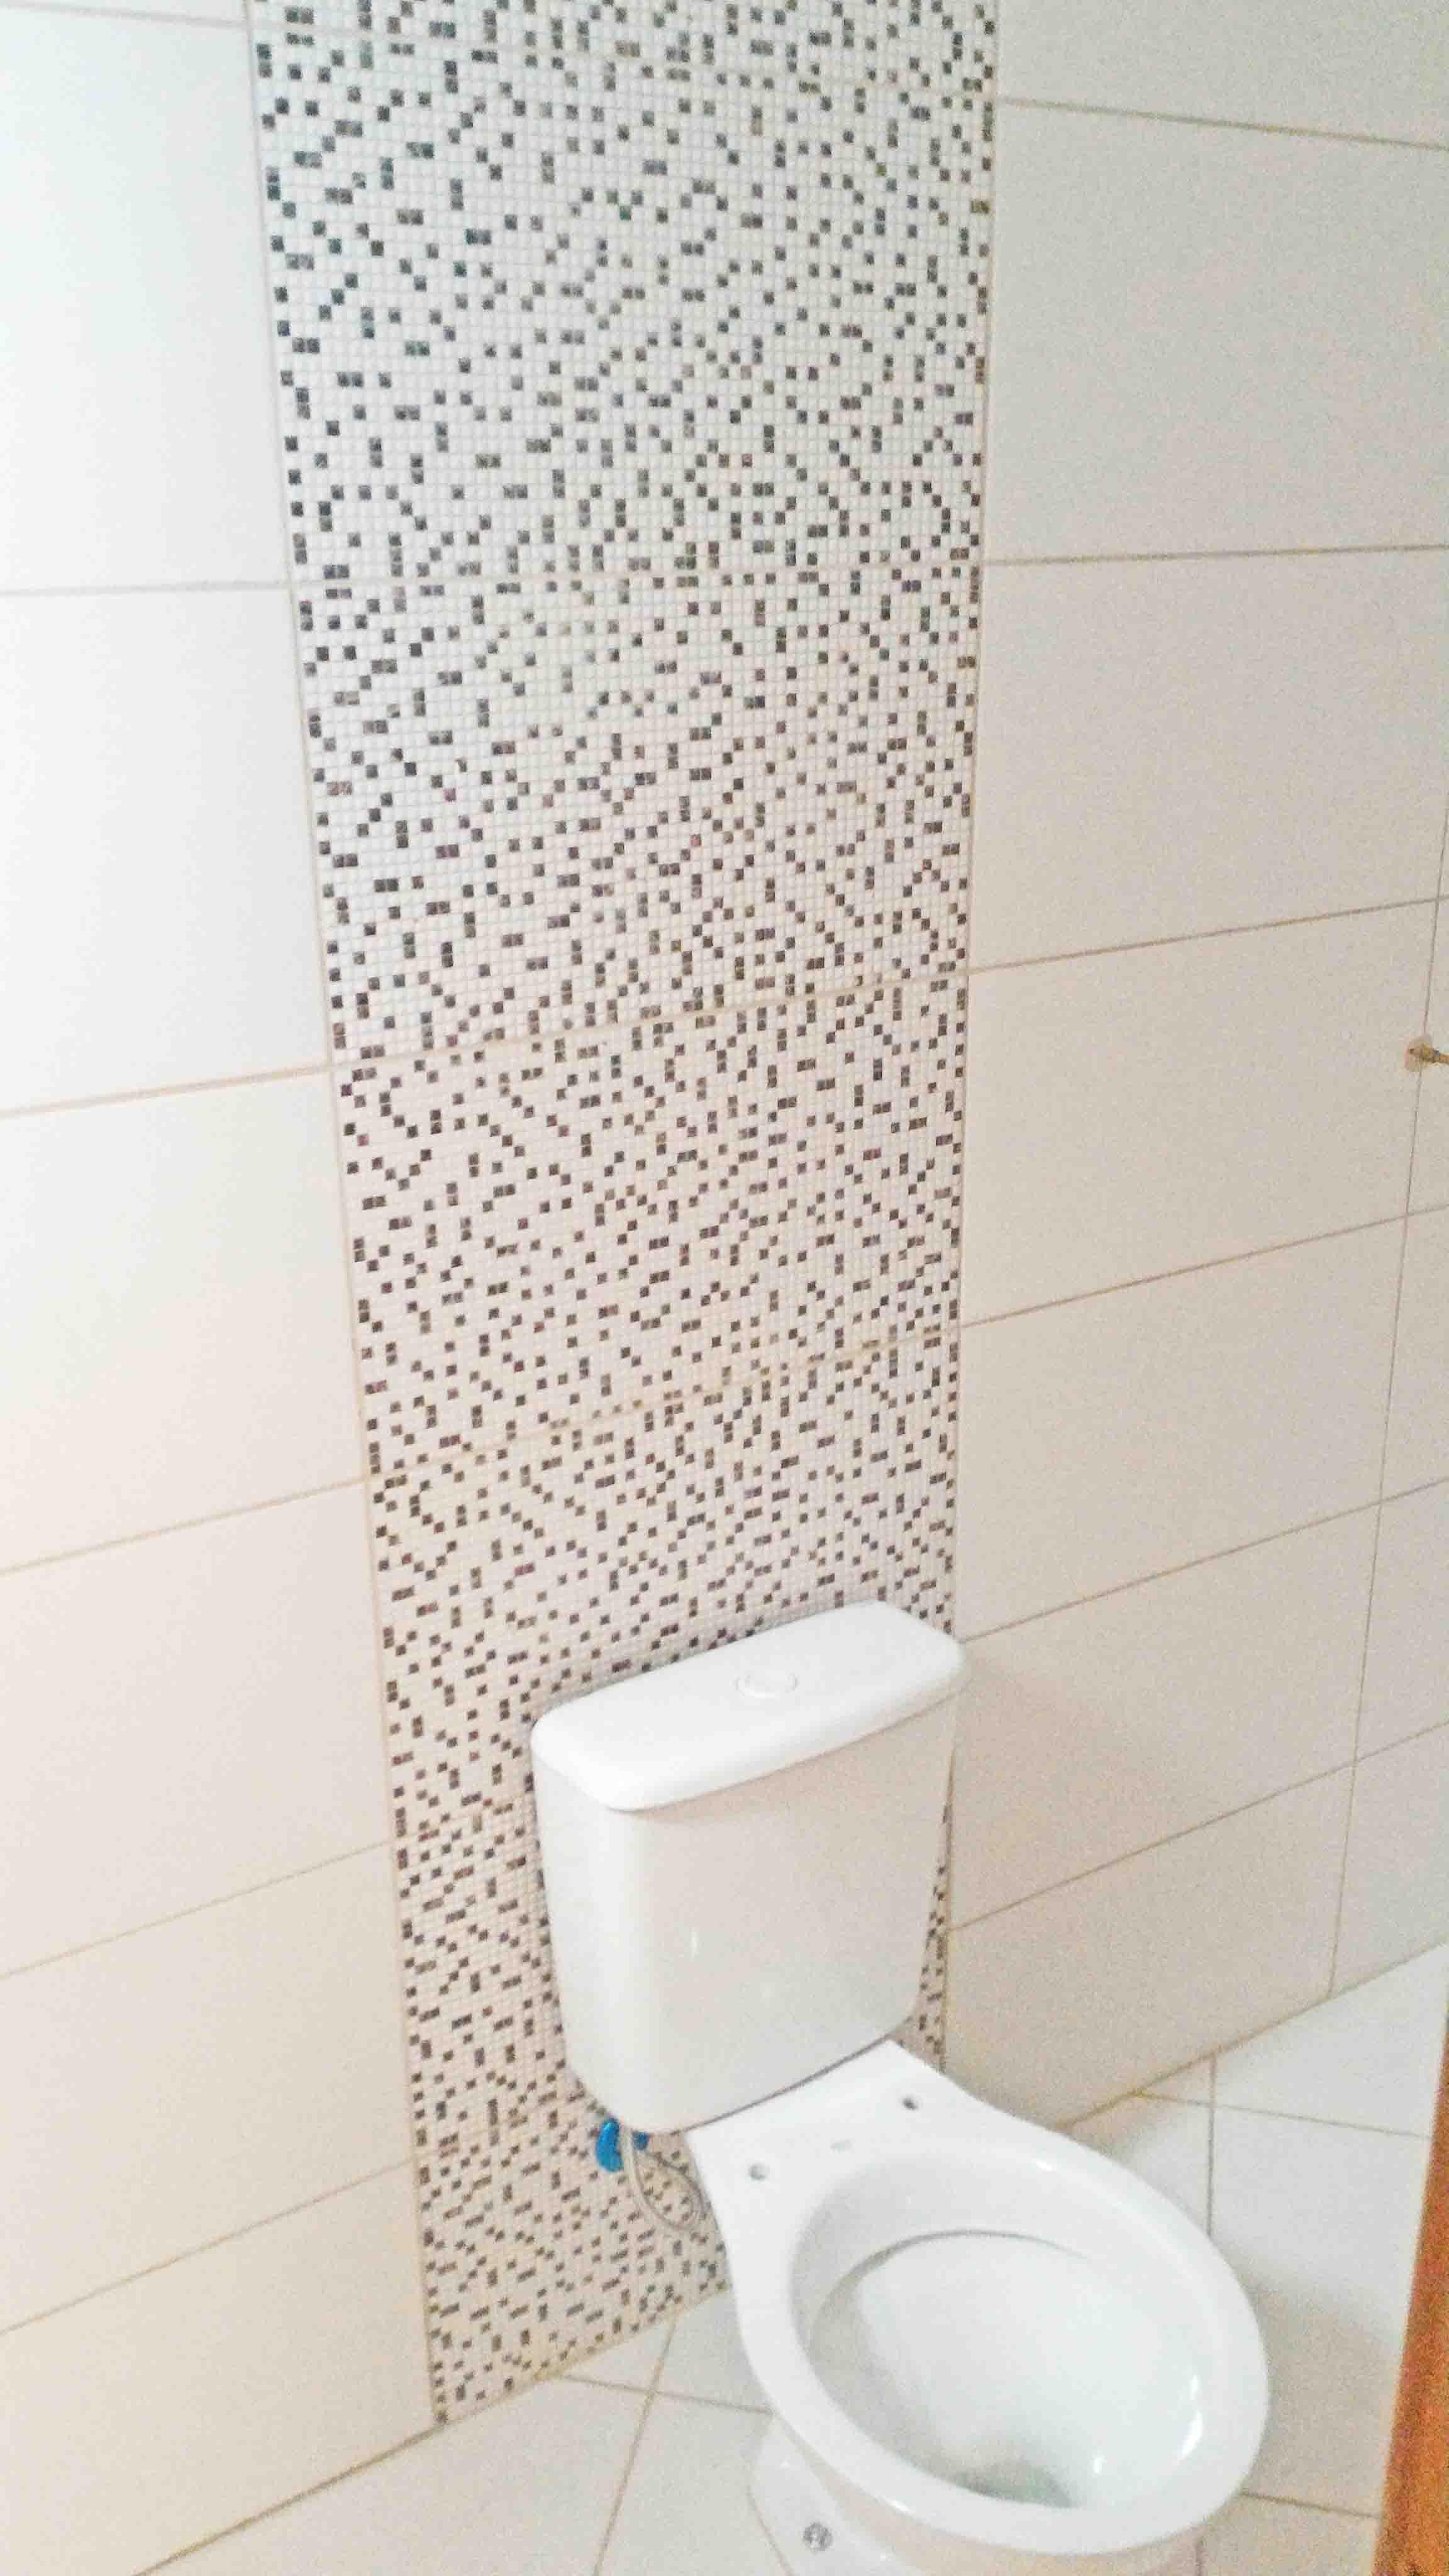 Ap202-vaso-banheiro